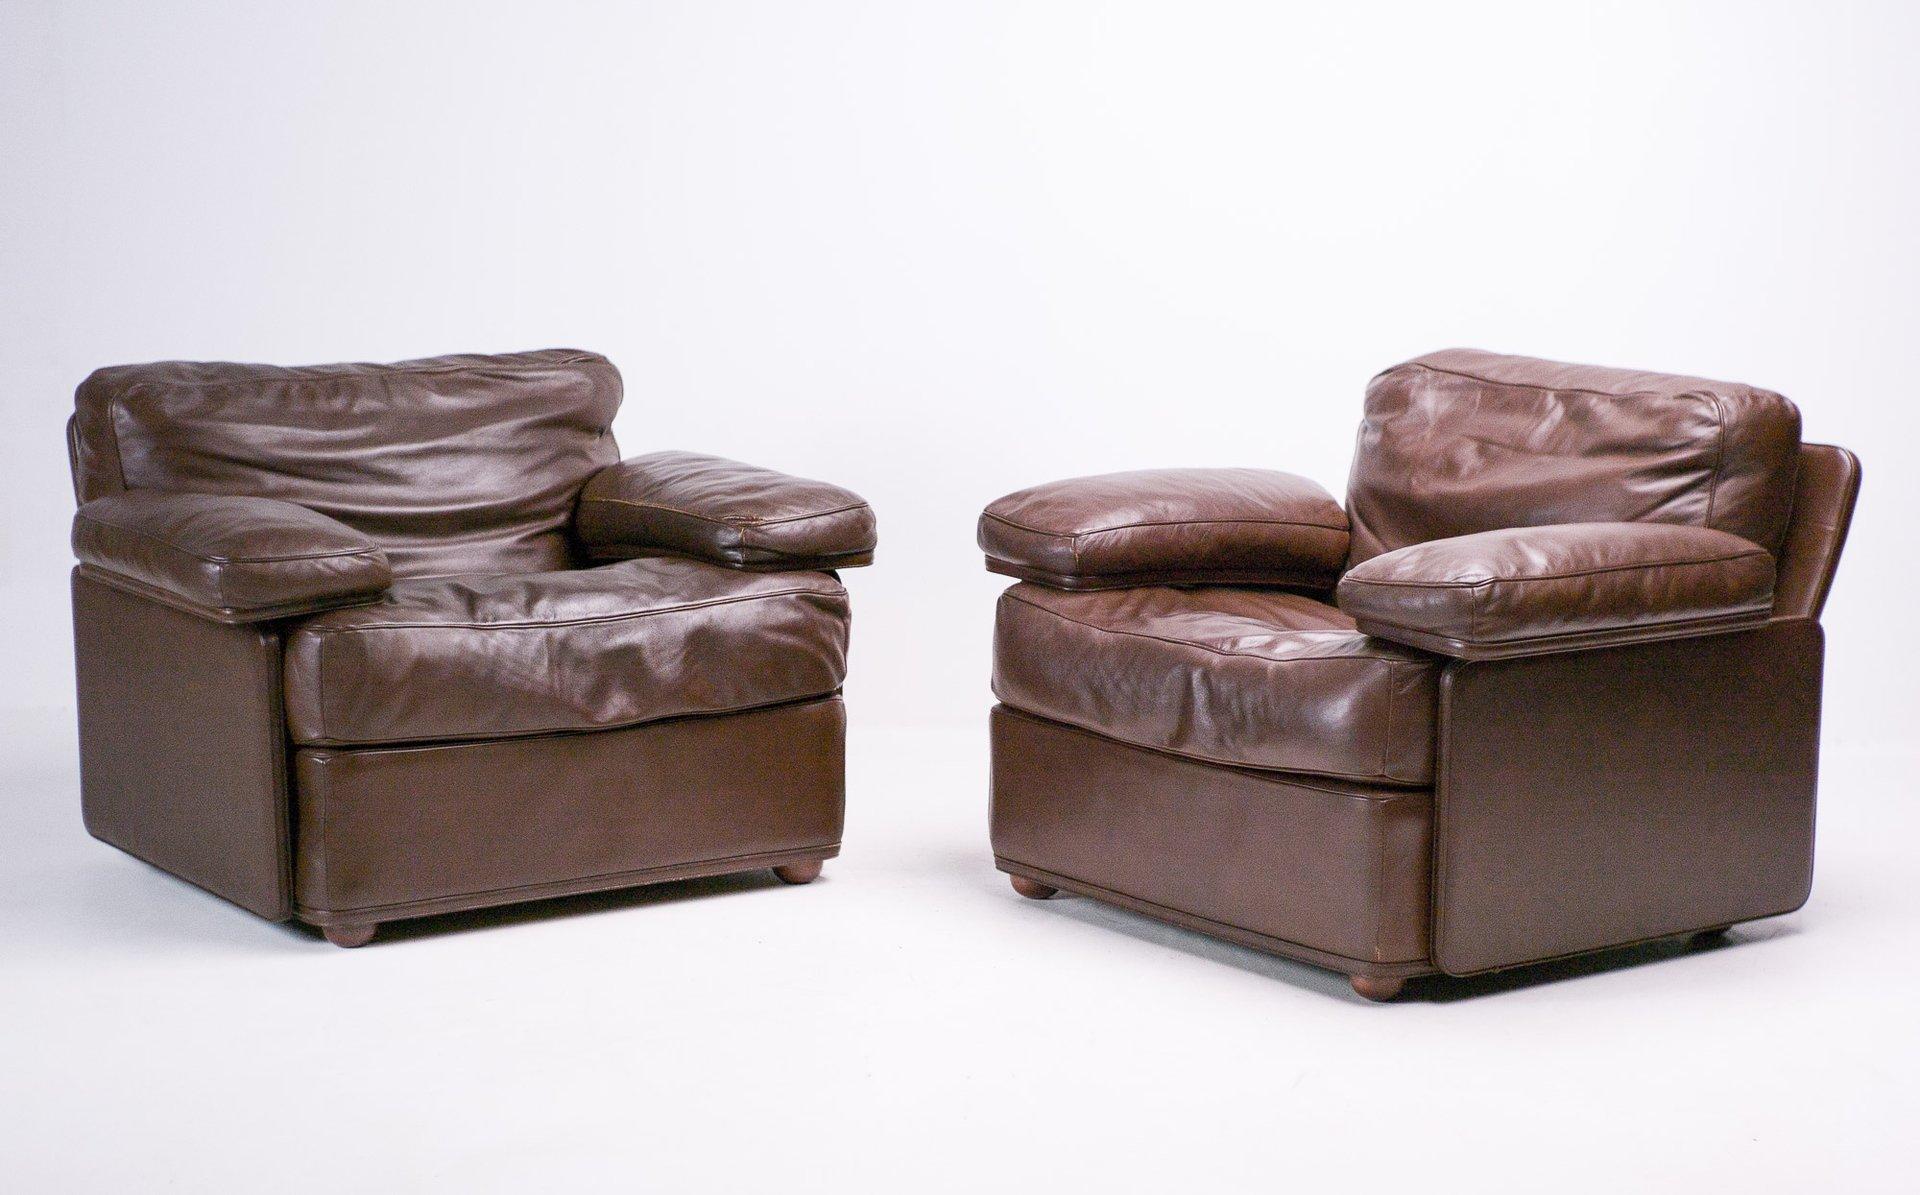 canap moderne par tito agnoli pour poltrona frau italie. Black Bedroom Furniture Sets. Home Design Ideas